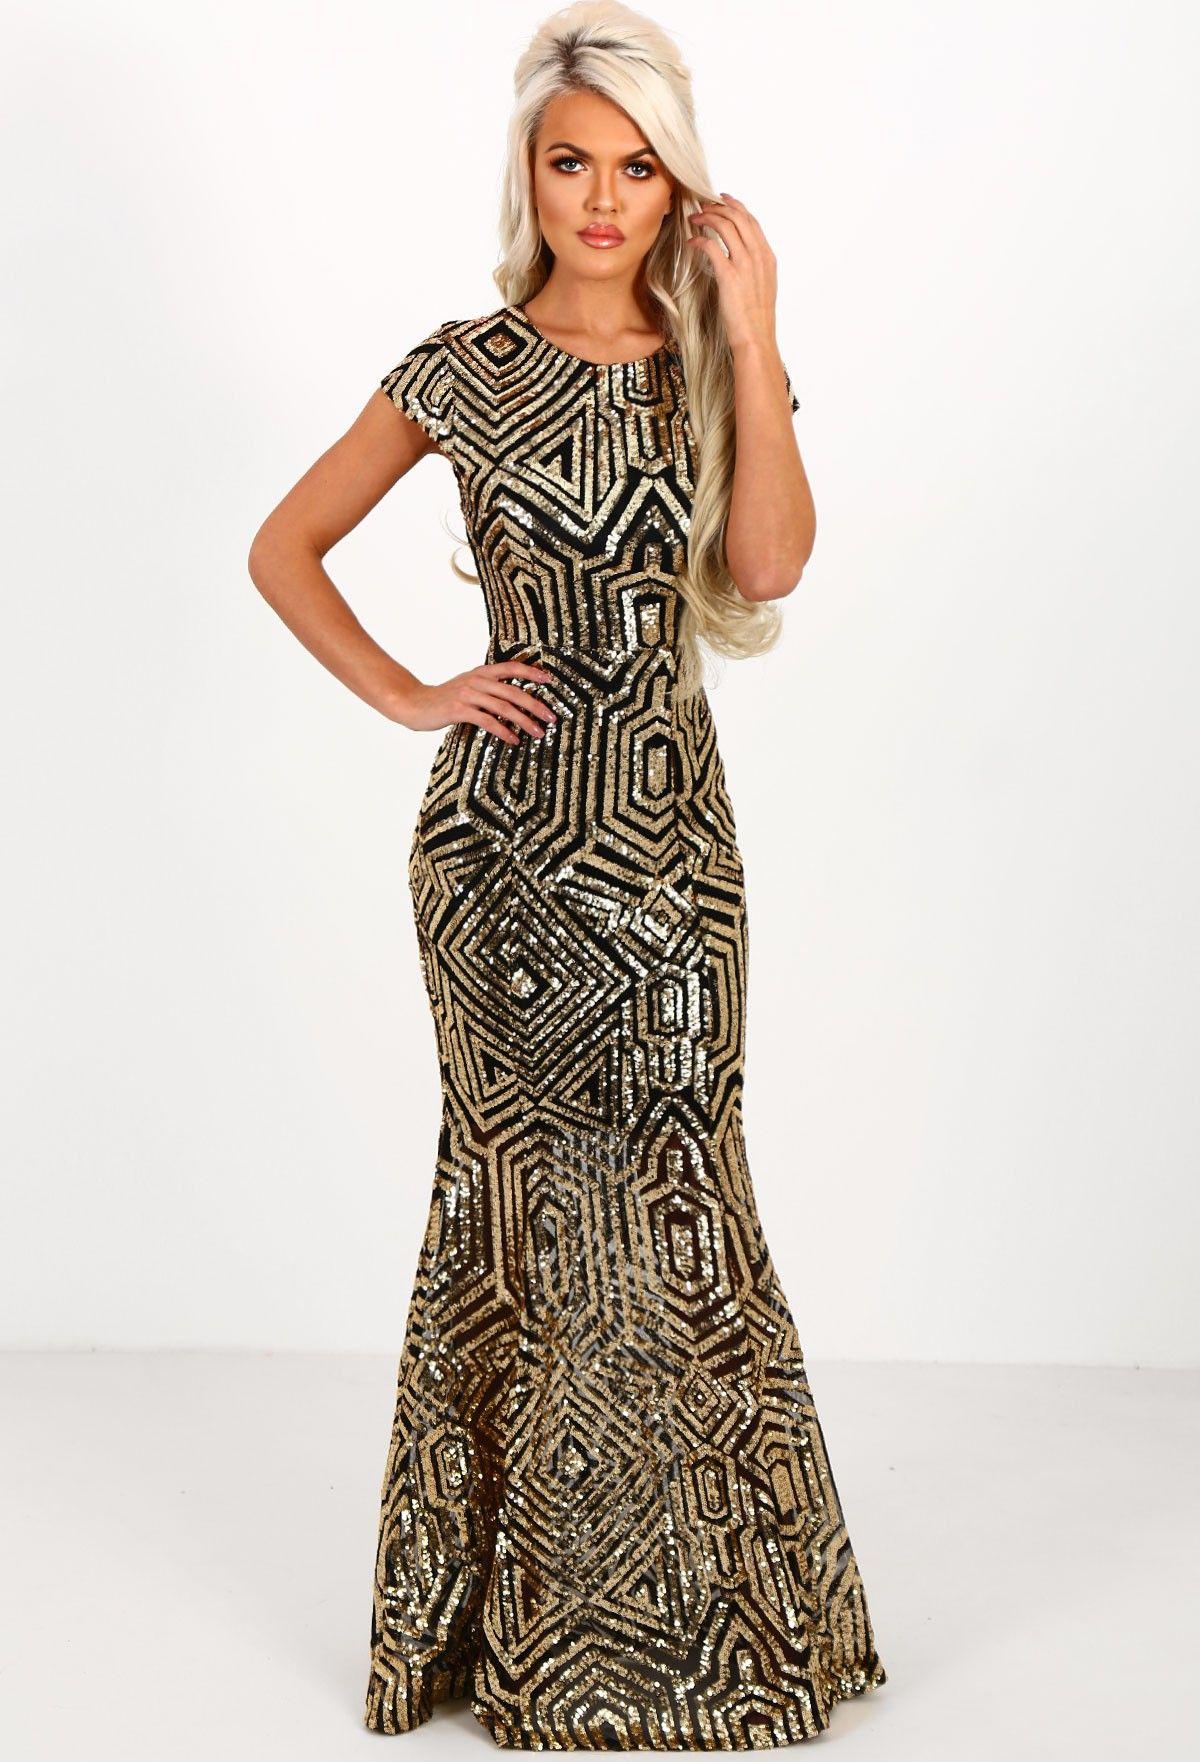 a0ba0ff867a8 Millionaire Gold and Black Sequin Maxi Dress - 8   Purple prom ...